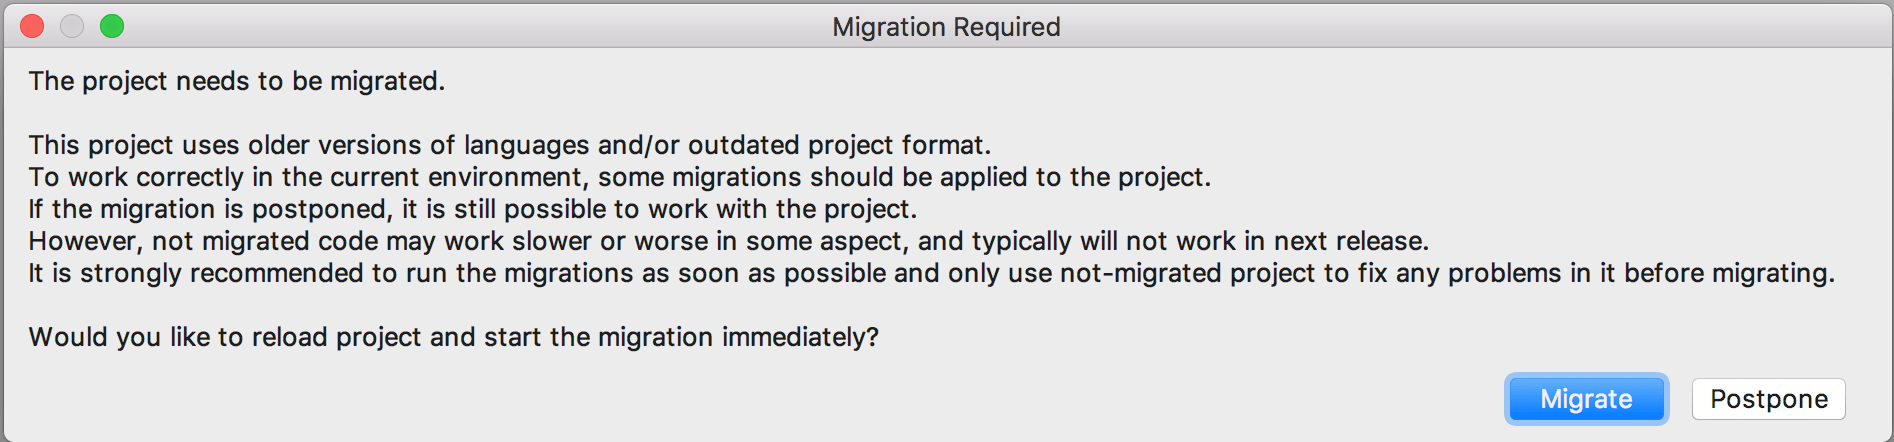 Migration1003